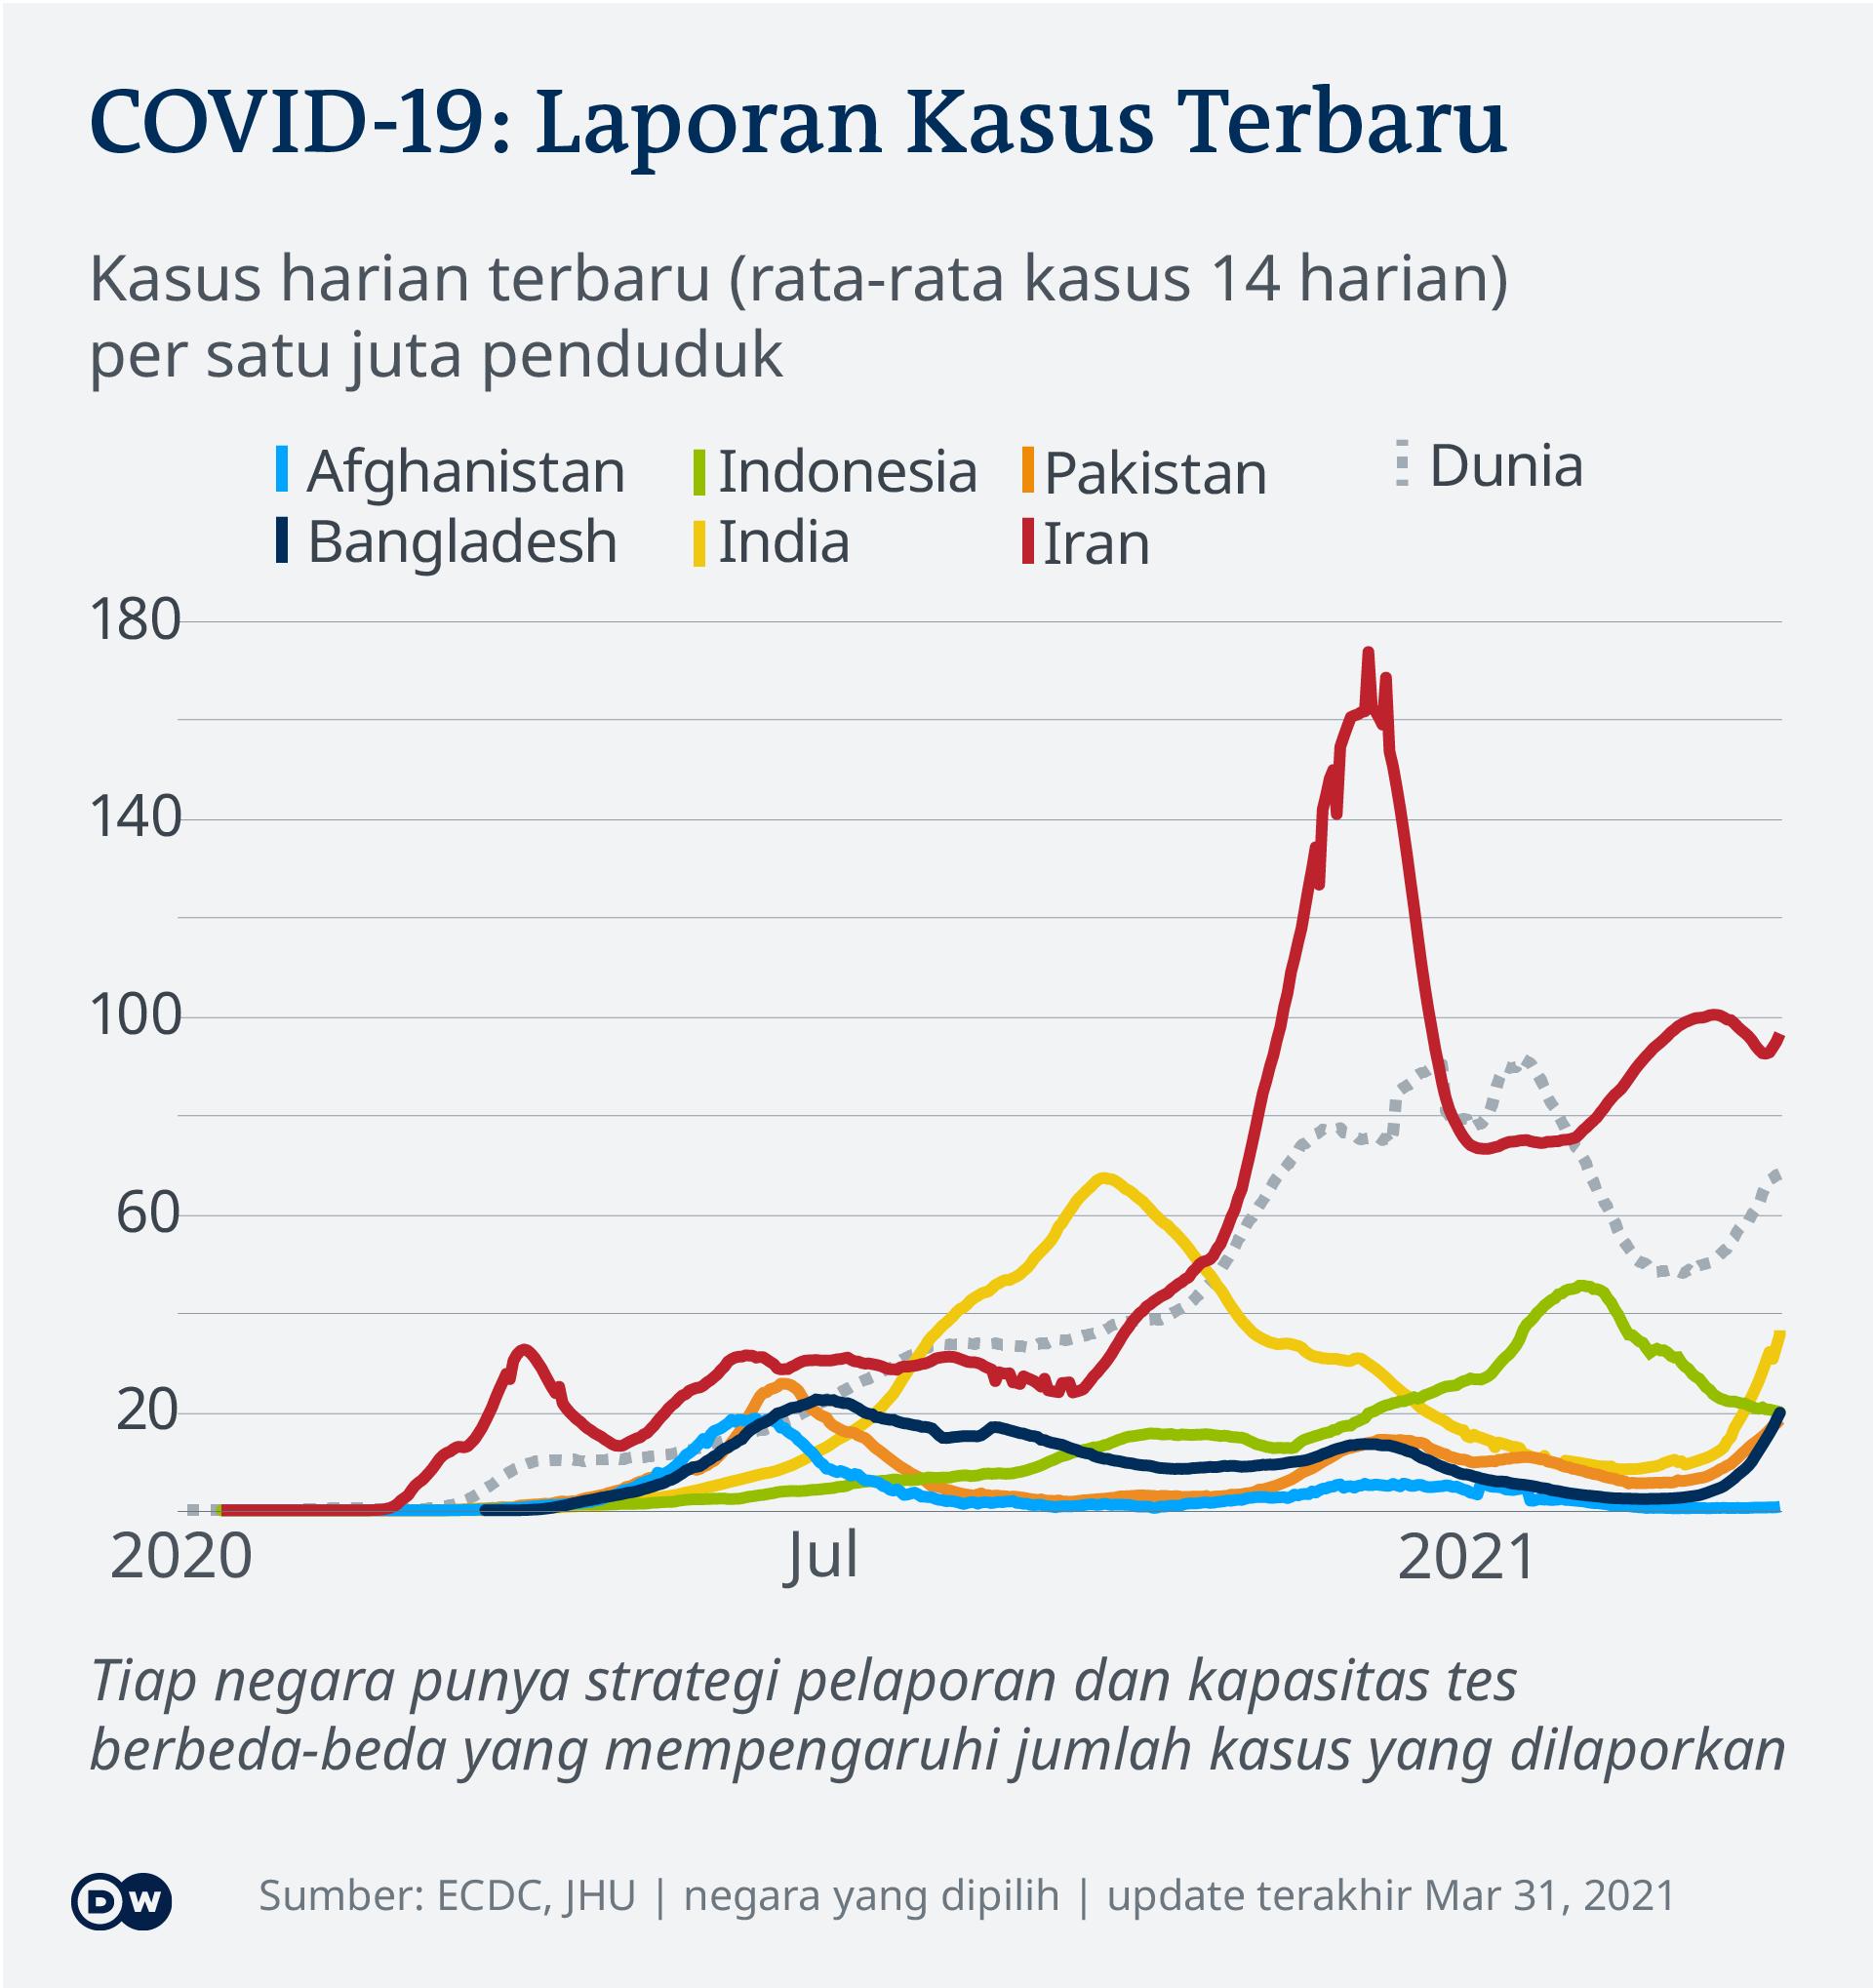 Data kasus harian baru COVID-19 di negara-negara Asia tiap satu juta penduduk, per 3 Maret 2021